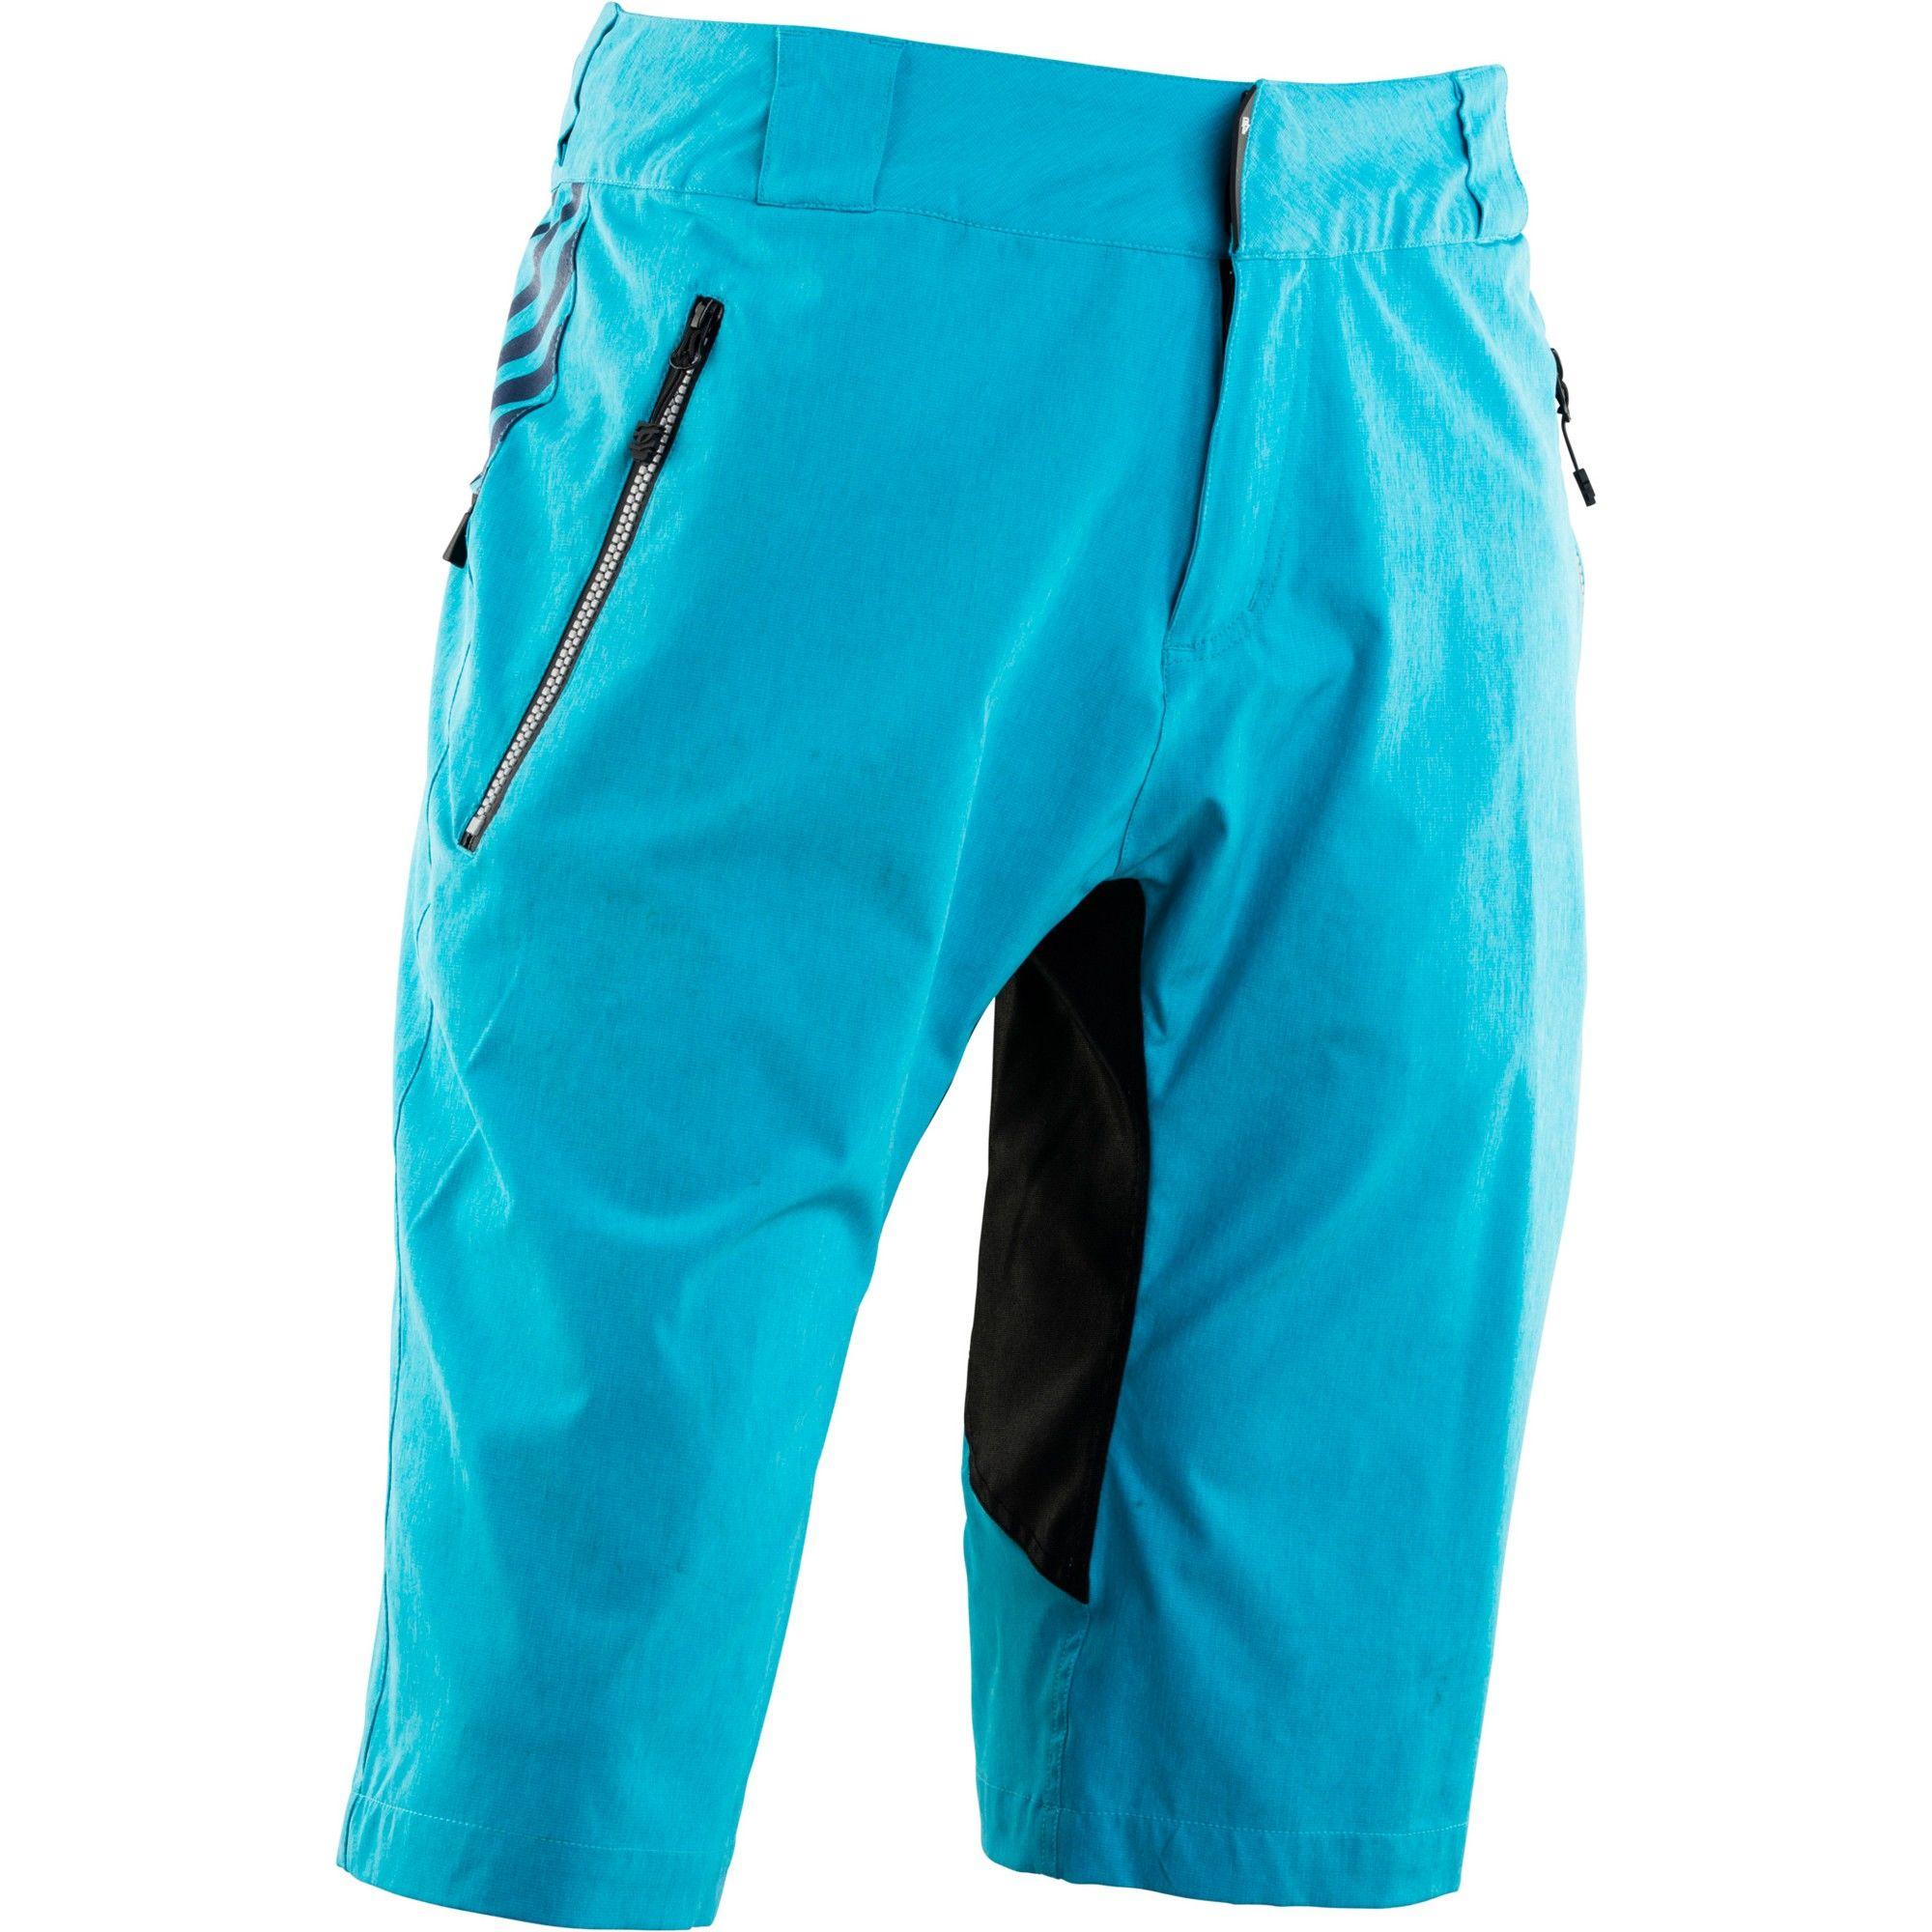 Race Face Stage Shorts Blau, Male Shorts, M